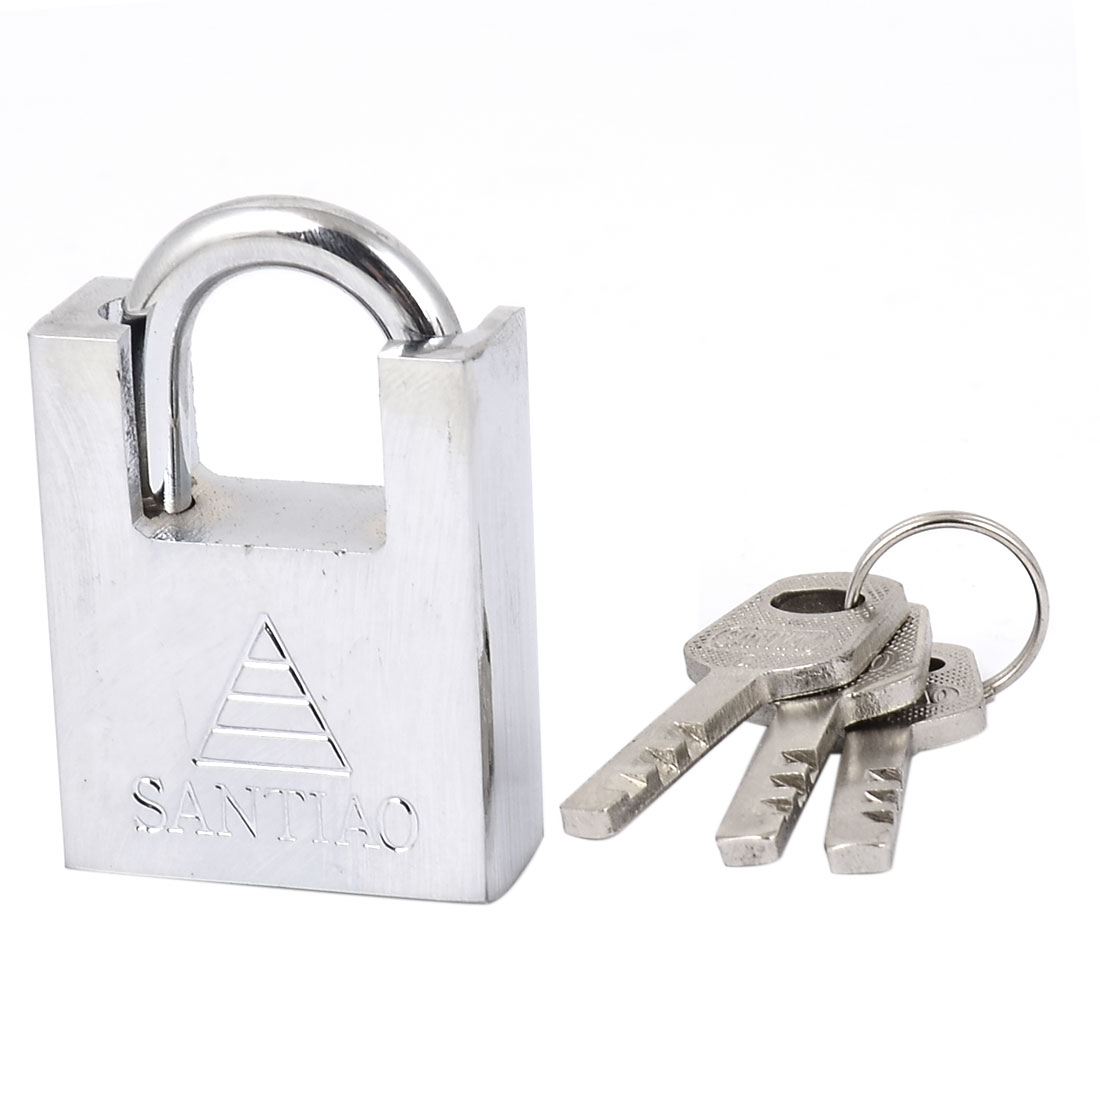 Home Offics Door Hardened Closed Shackle Security Padlock Lock 40mm Width w 3 Keys